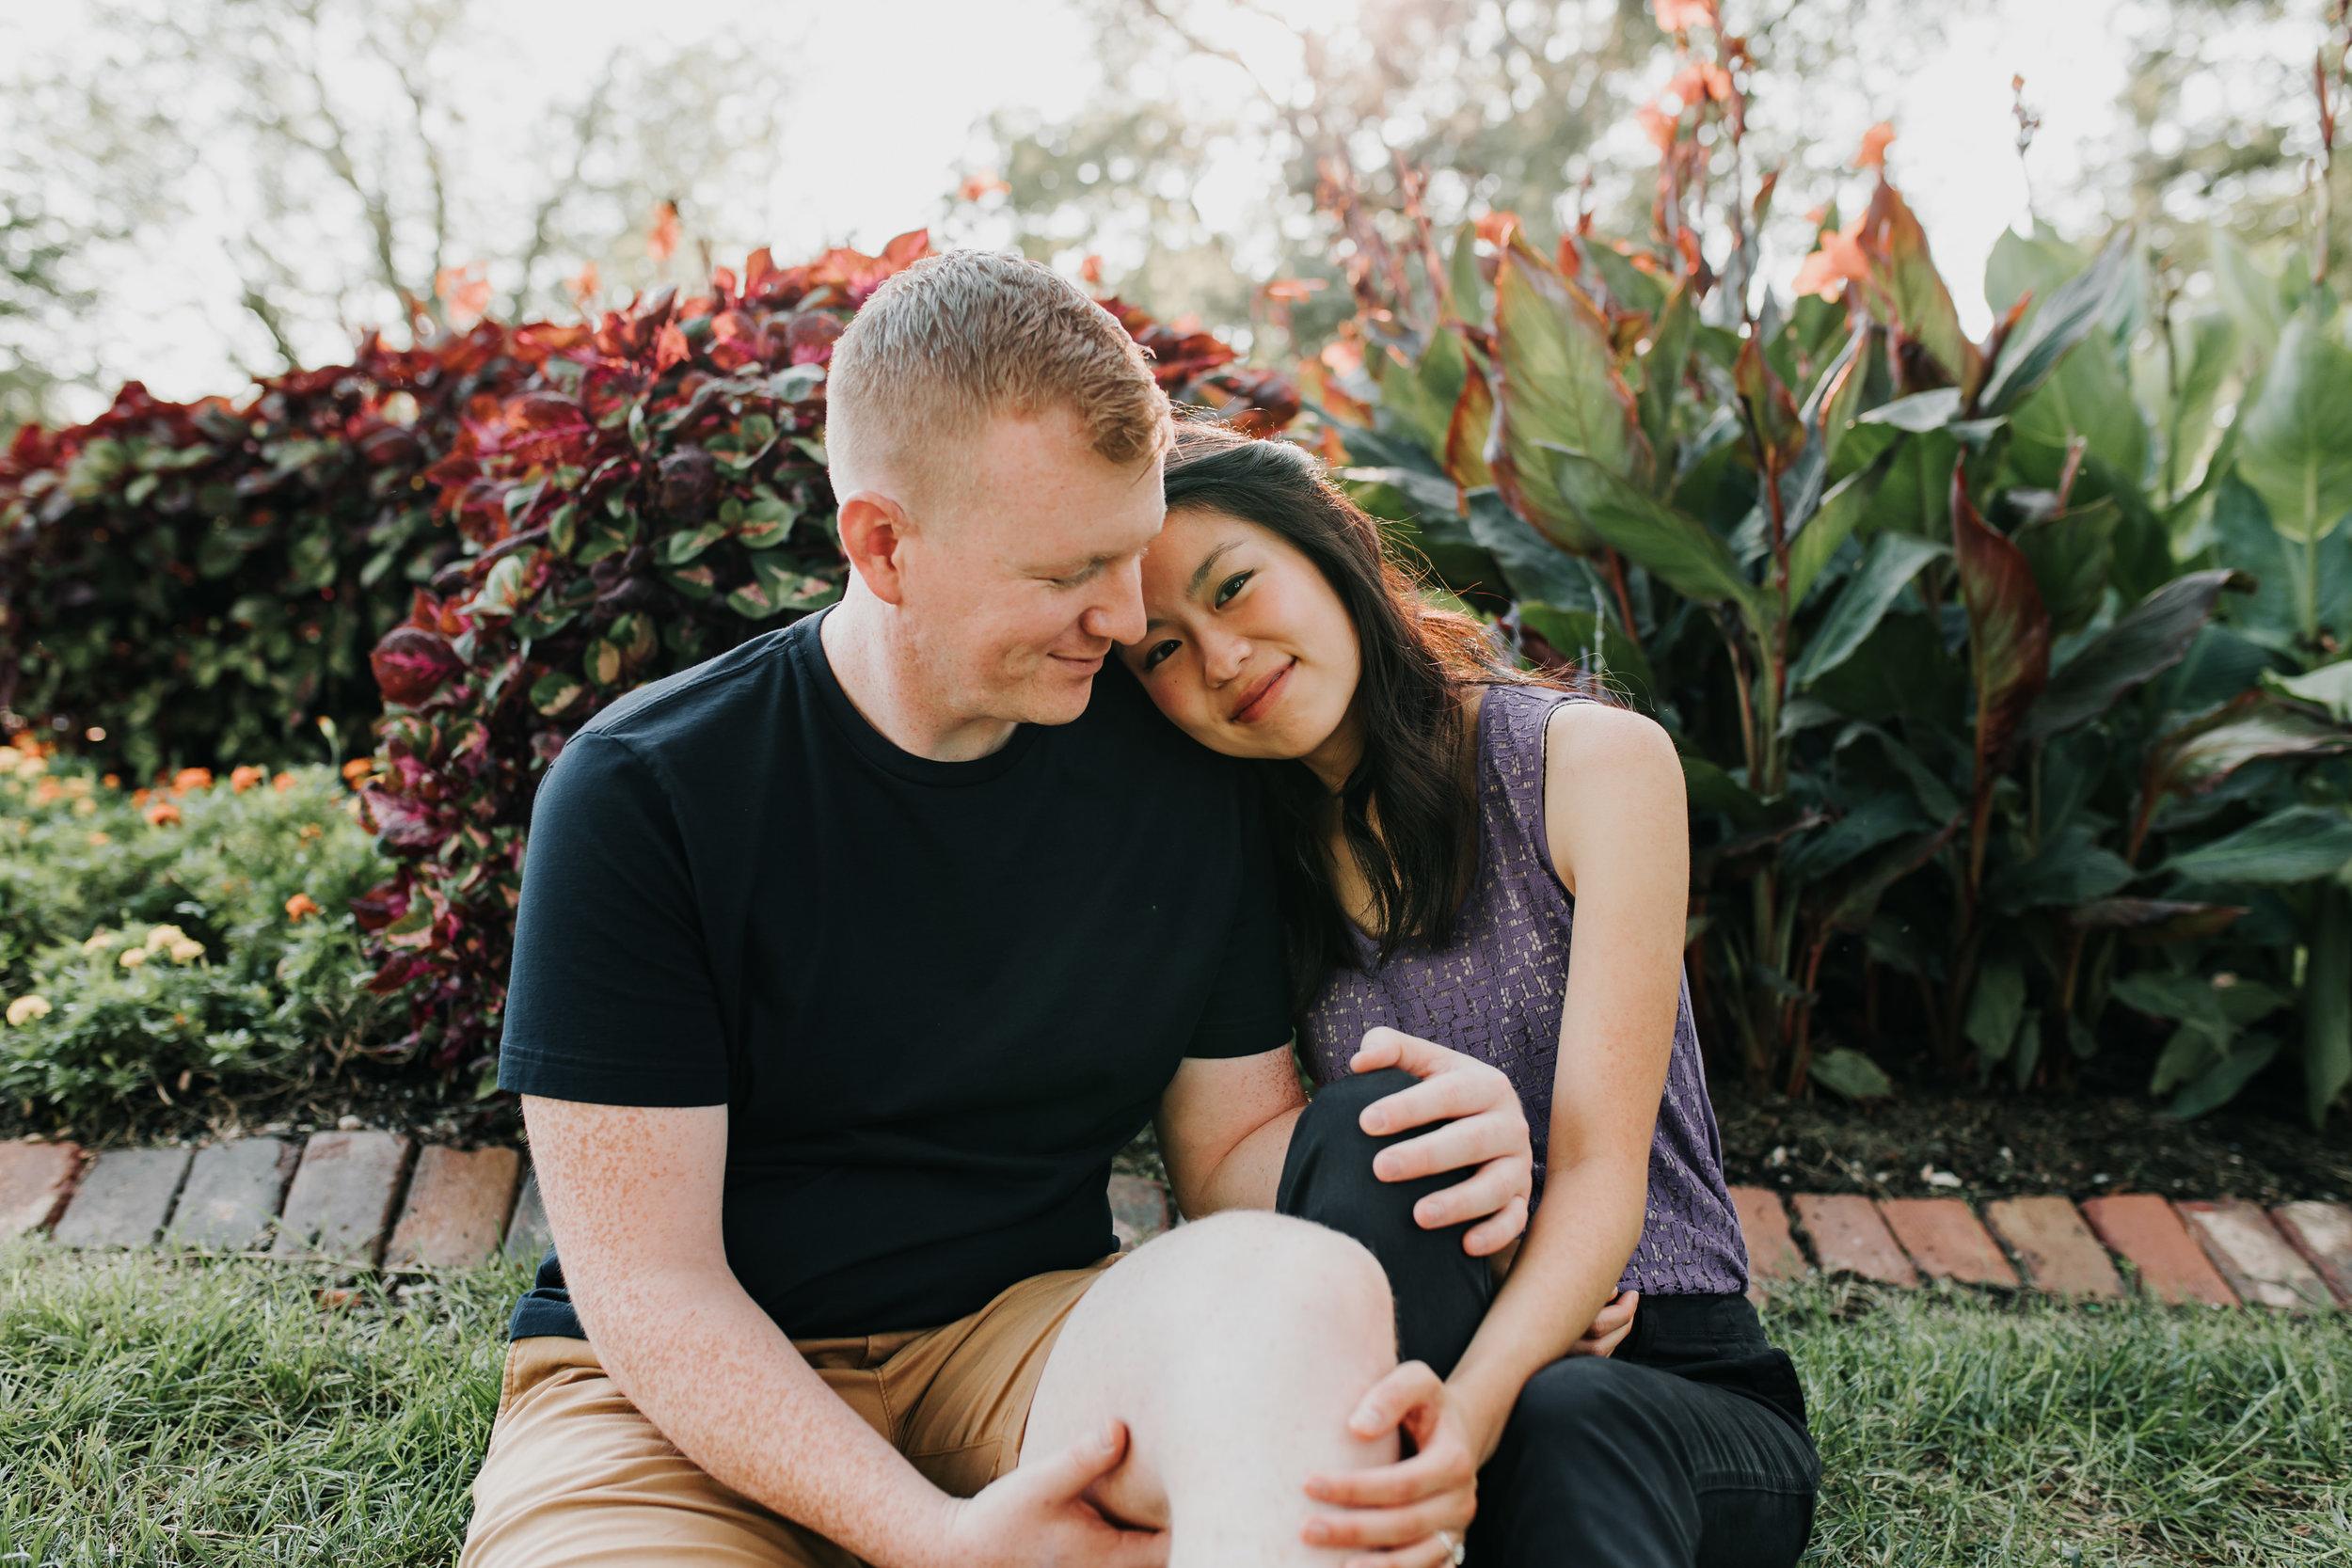 Catherin & Kyle - Married - Nathaniel Jensen Photography - Omaha Nebraska Wedding Photograper - Memorial Park - Joslyn Castle Engagement Session-16.jpg